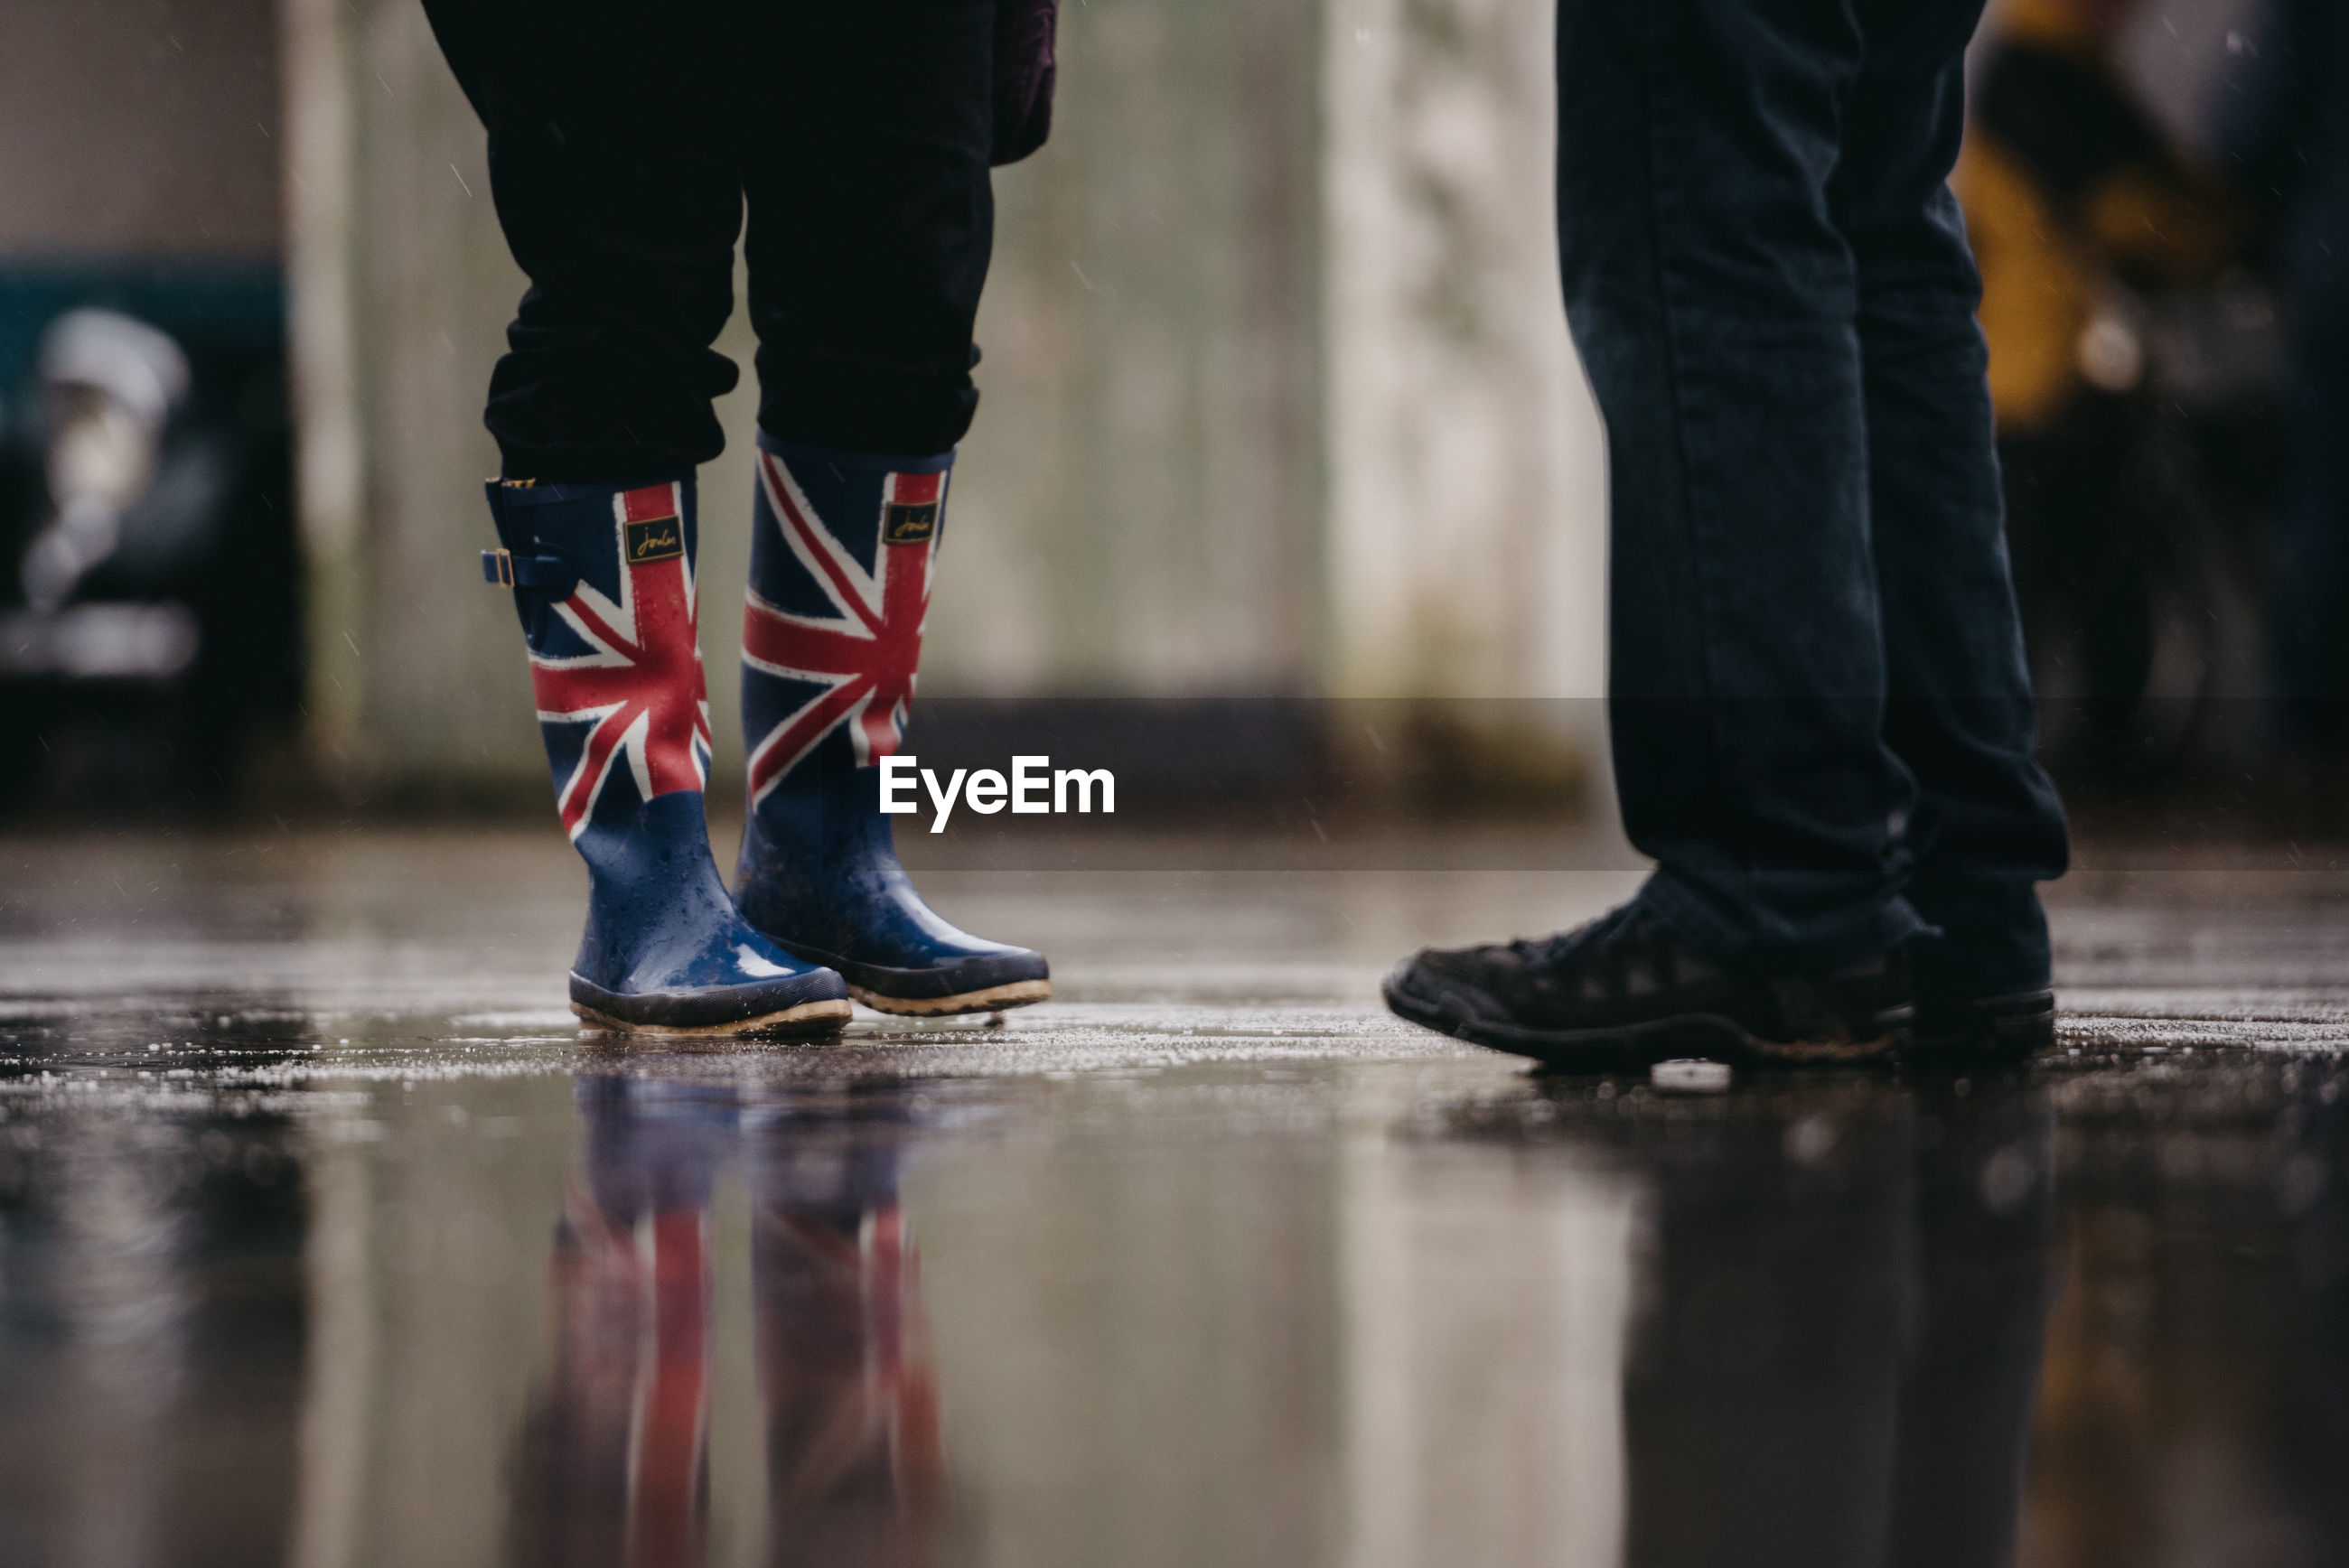 Low section of people wearing designed footwear